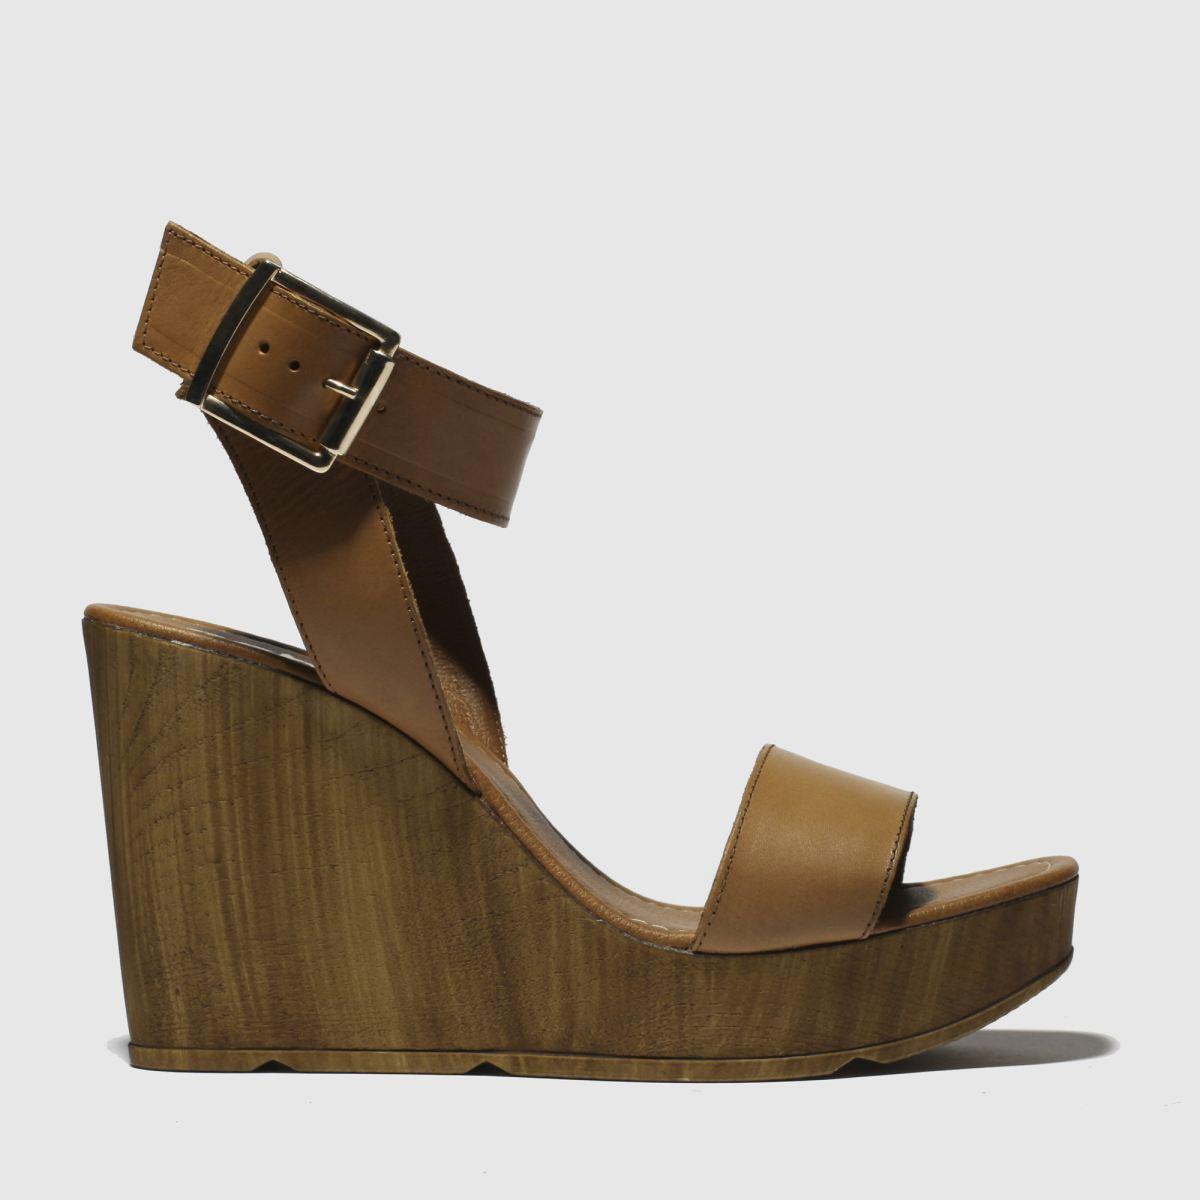 Schuh Tan Oslo Sandals